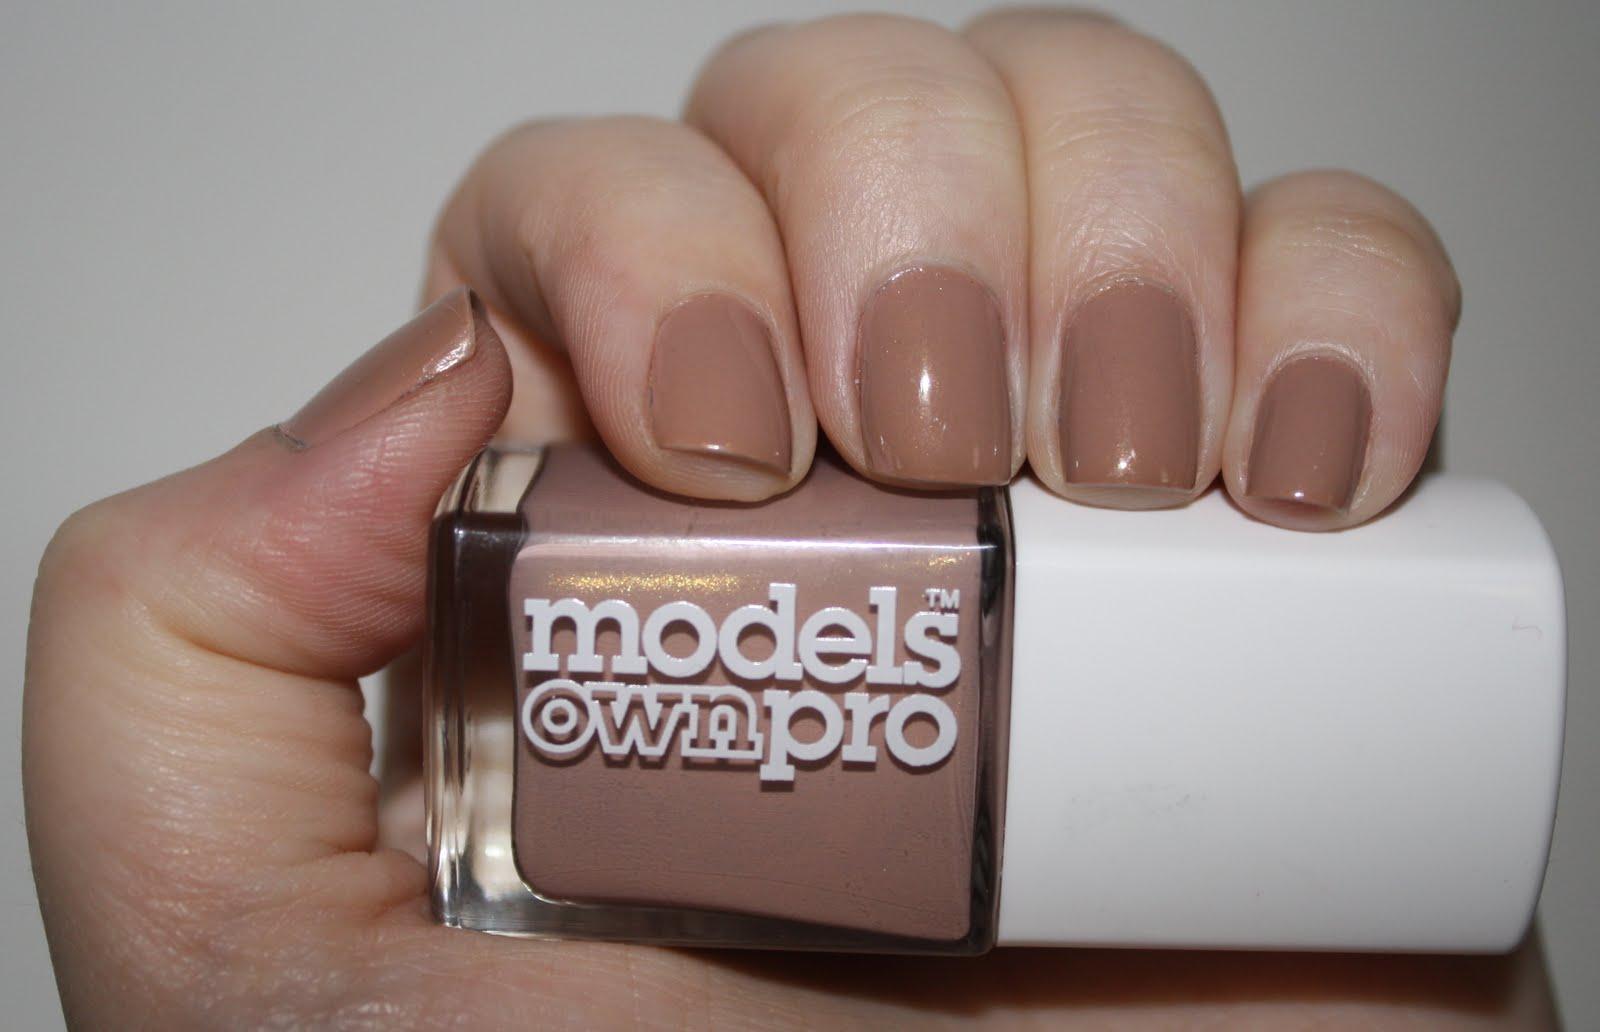 a million dresses   UK Fashion and Lifestyle Blog: Models Own Pro ...